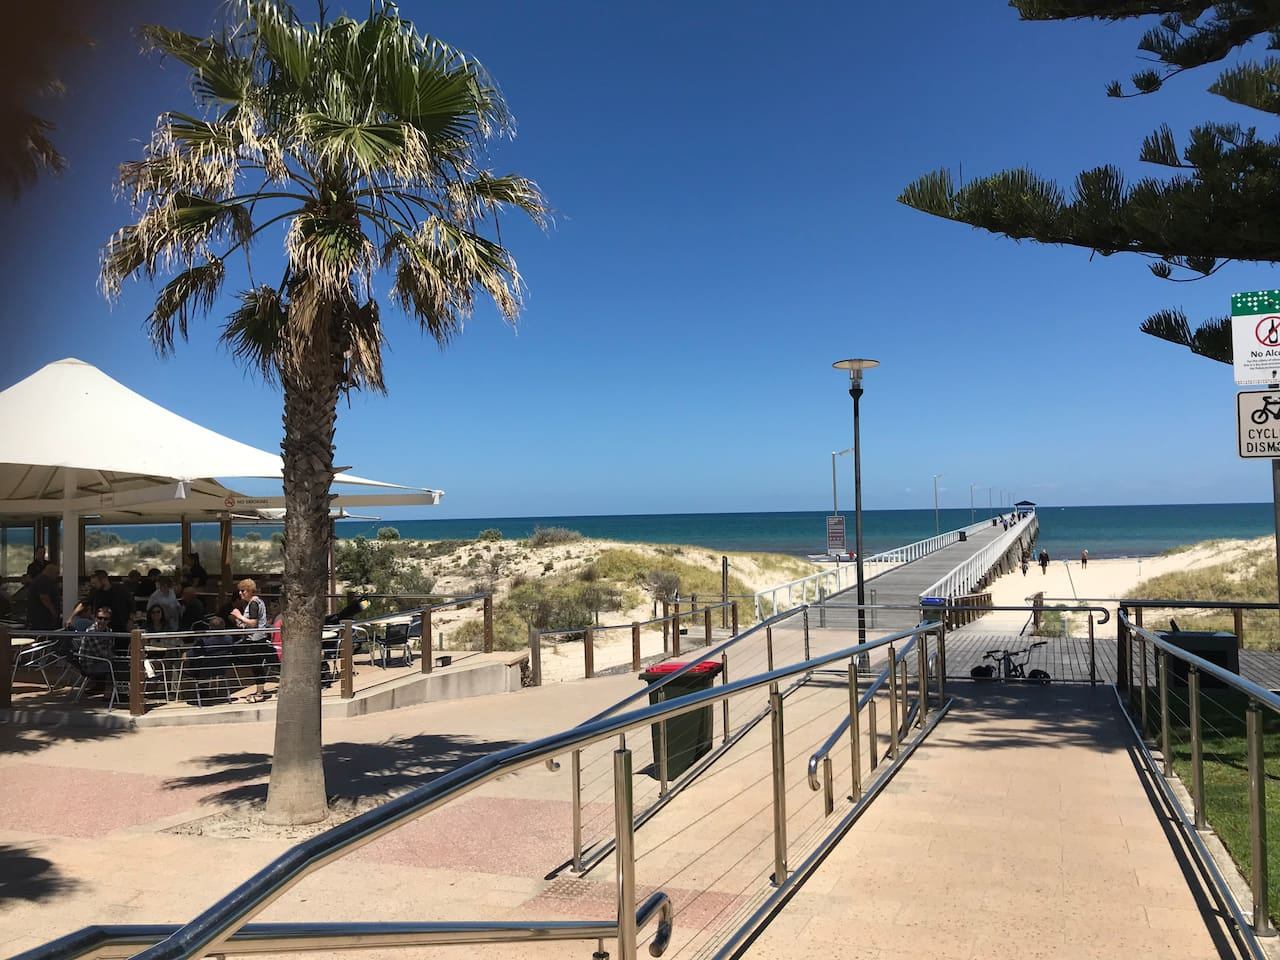 Grange Jetty cafe, Grange Hotel and beach a few minutes walk away